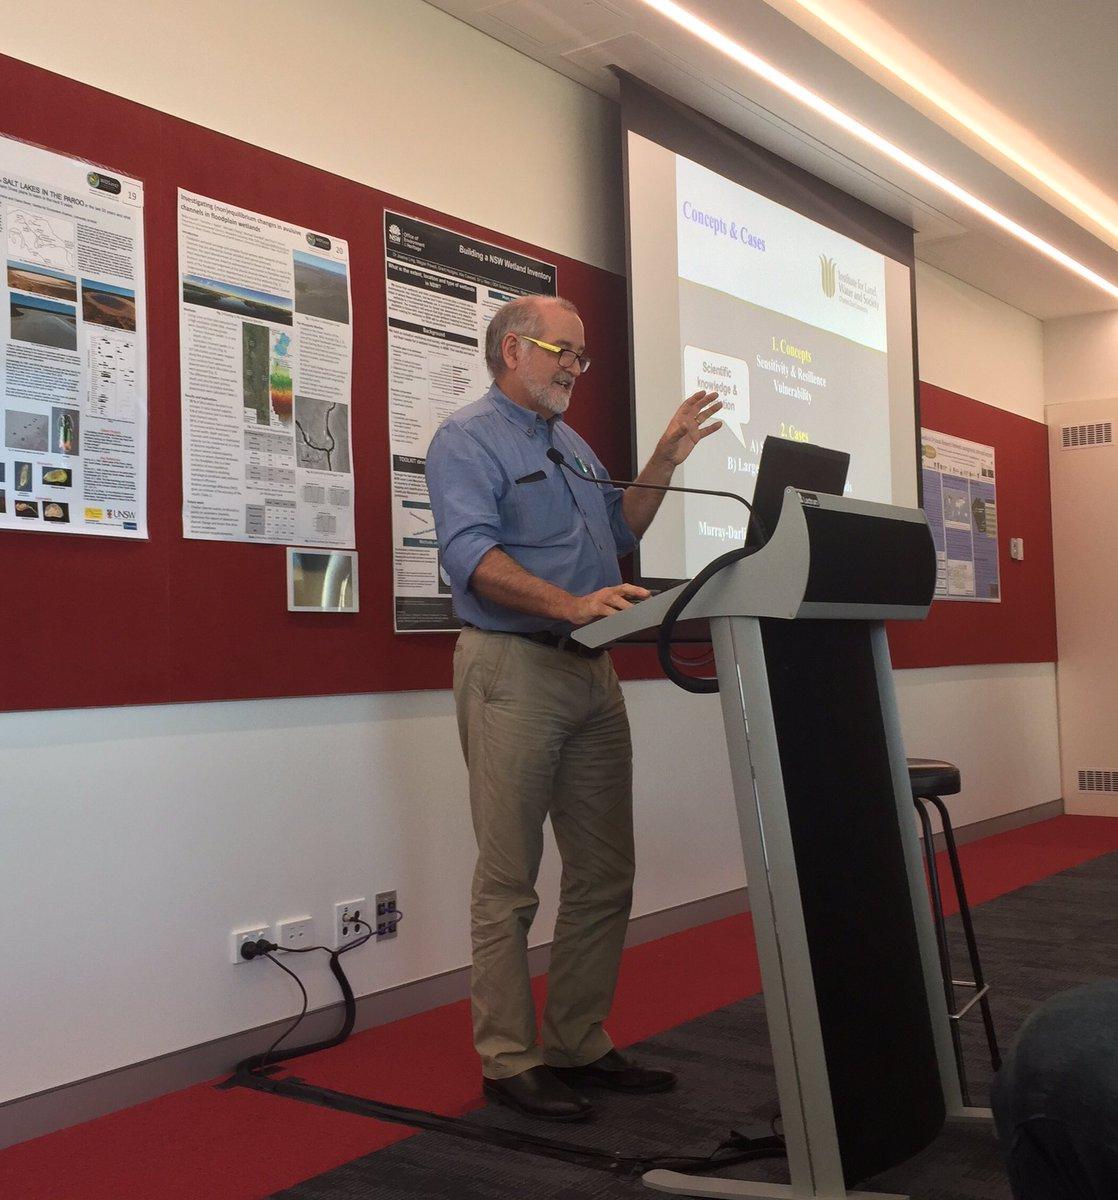 #WIDS2017MQ keynote speakers discuss #wetland #ecology #dynamics #resilience #sensitivity #vulnerability @MQSciEng @EnvScMQ @Macquarie_Uni<br>http://pic.twitter.com/qPS5DeQw1H